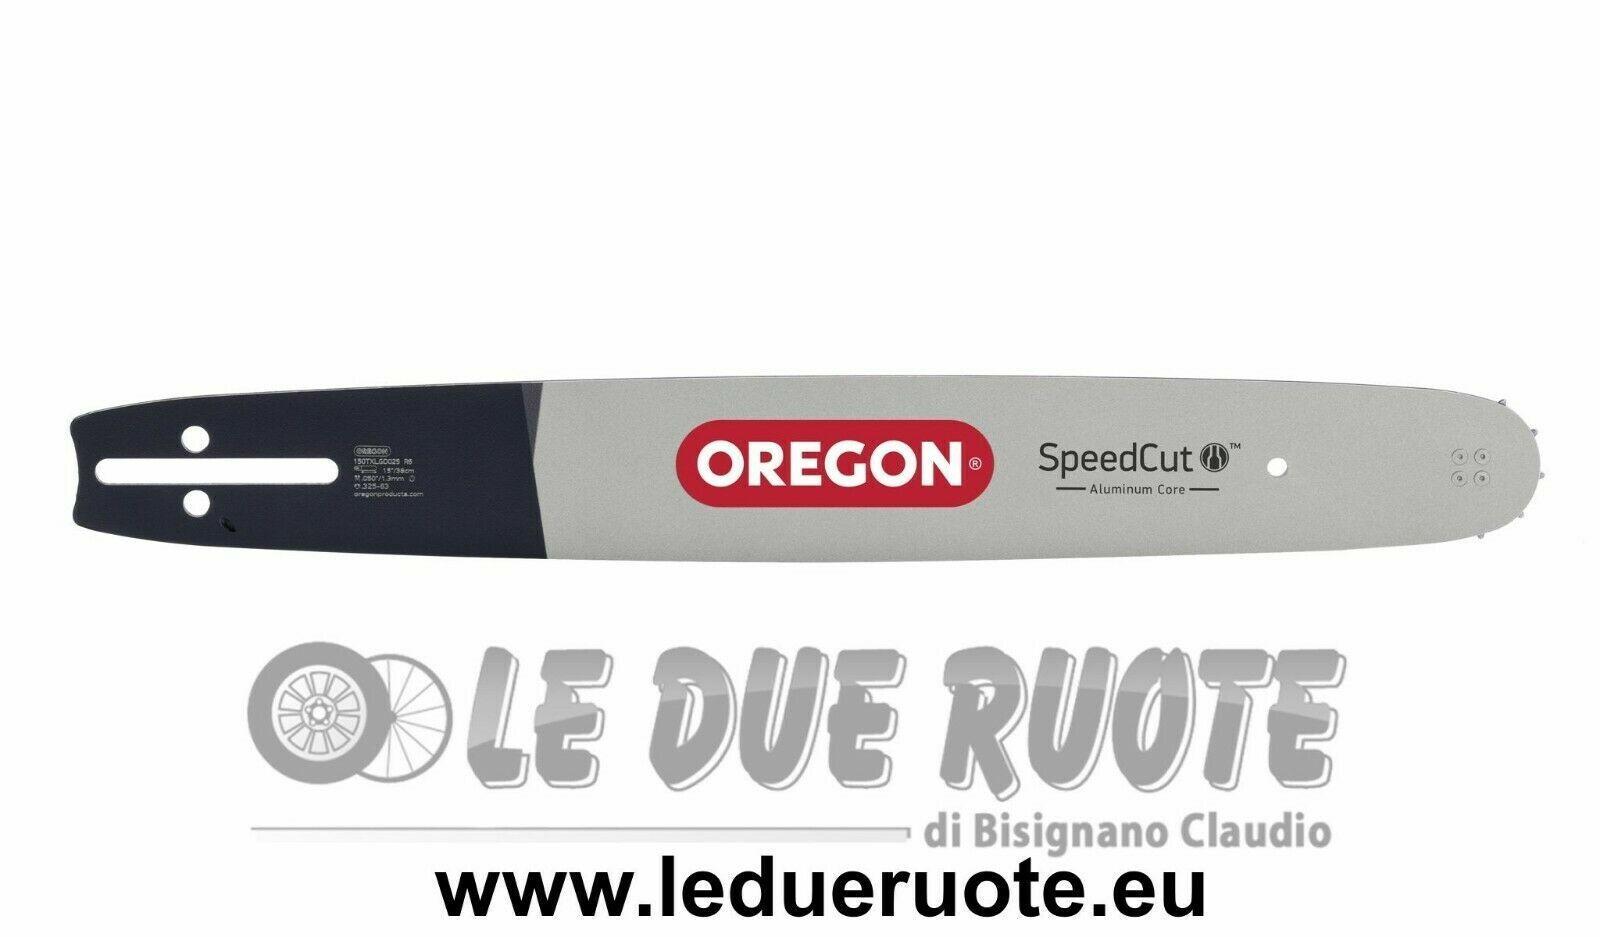 Bar Oregon Chainsaw Jonserot 2186 2188 820 830 Speed Cut™ 3 8   1.5